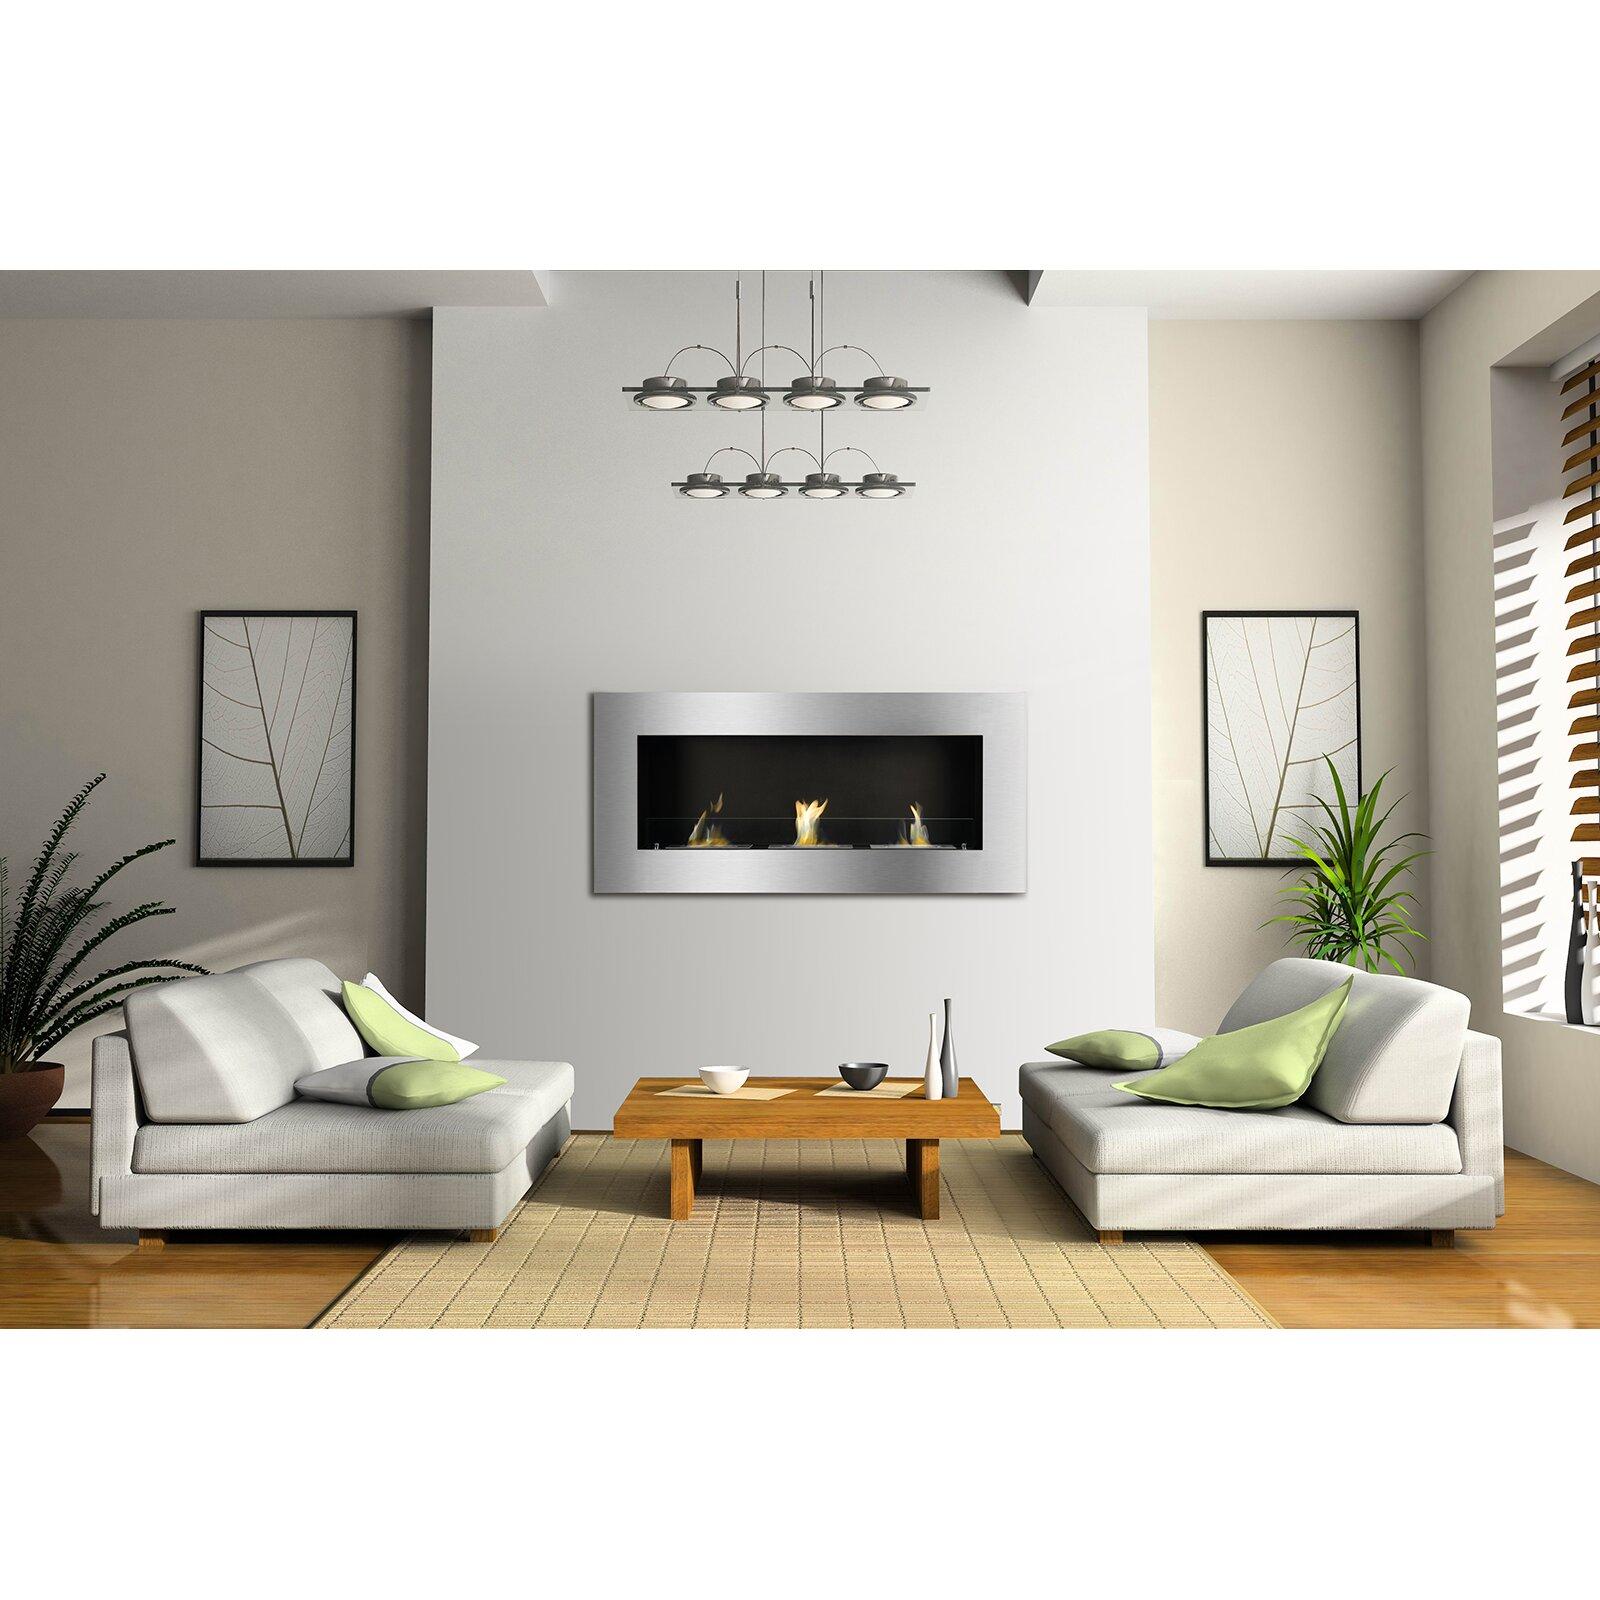 ignis optimum wall mount ethanol fireplace reviews wayfair supply